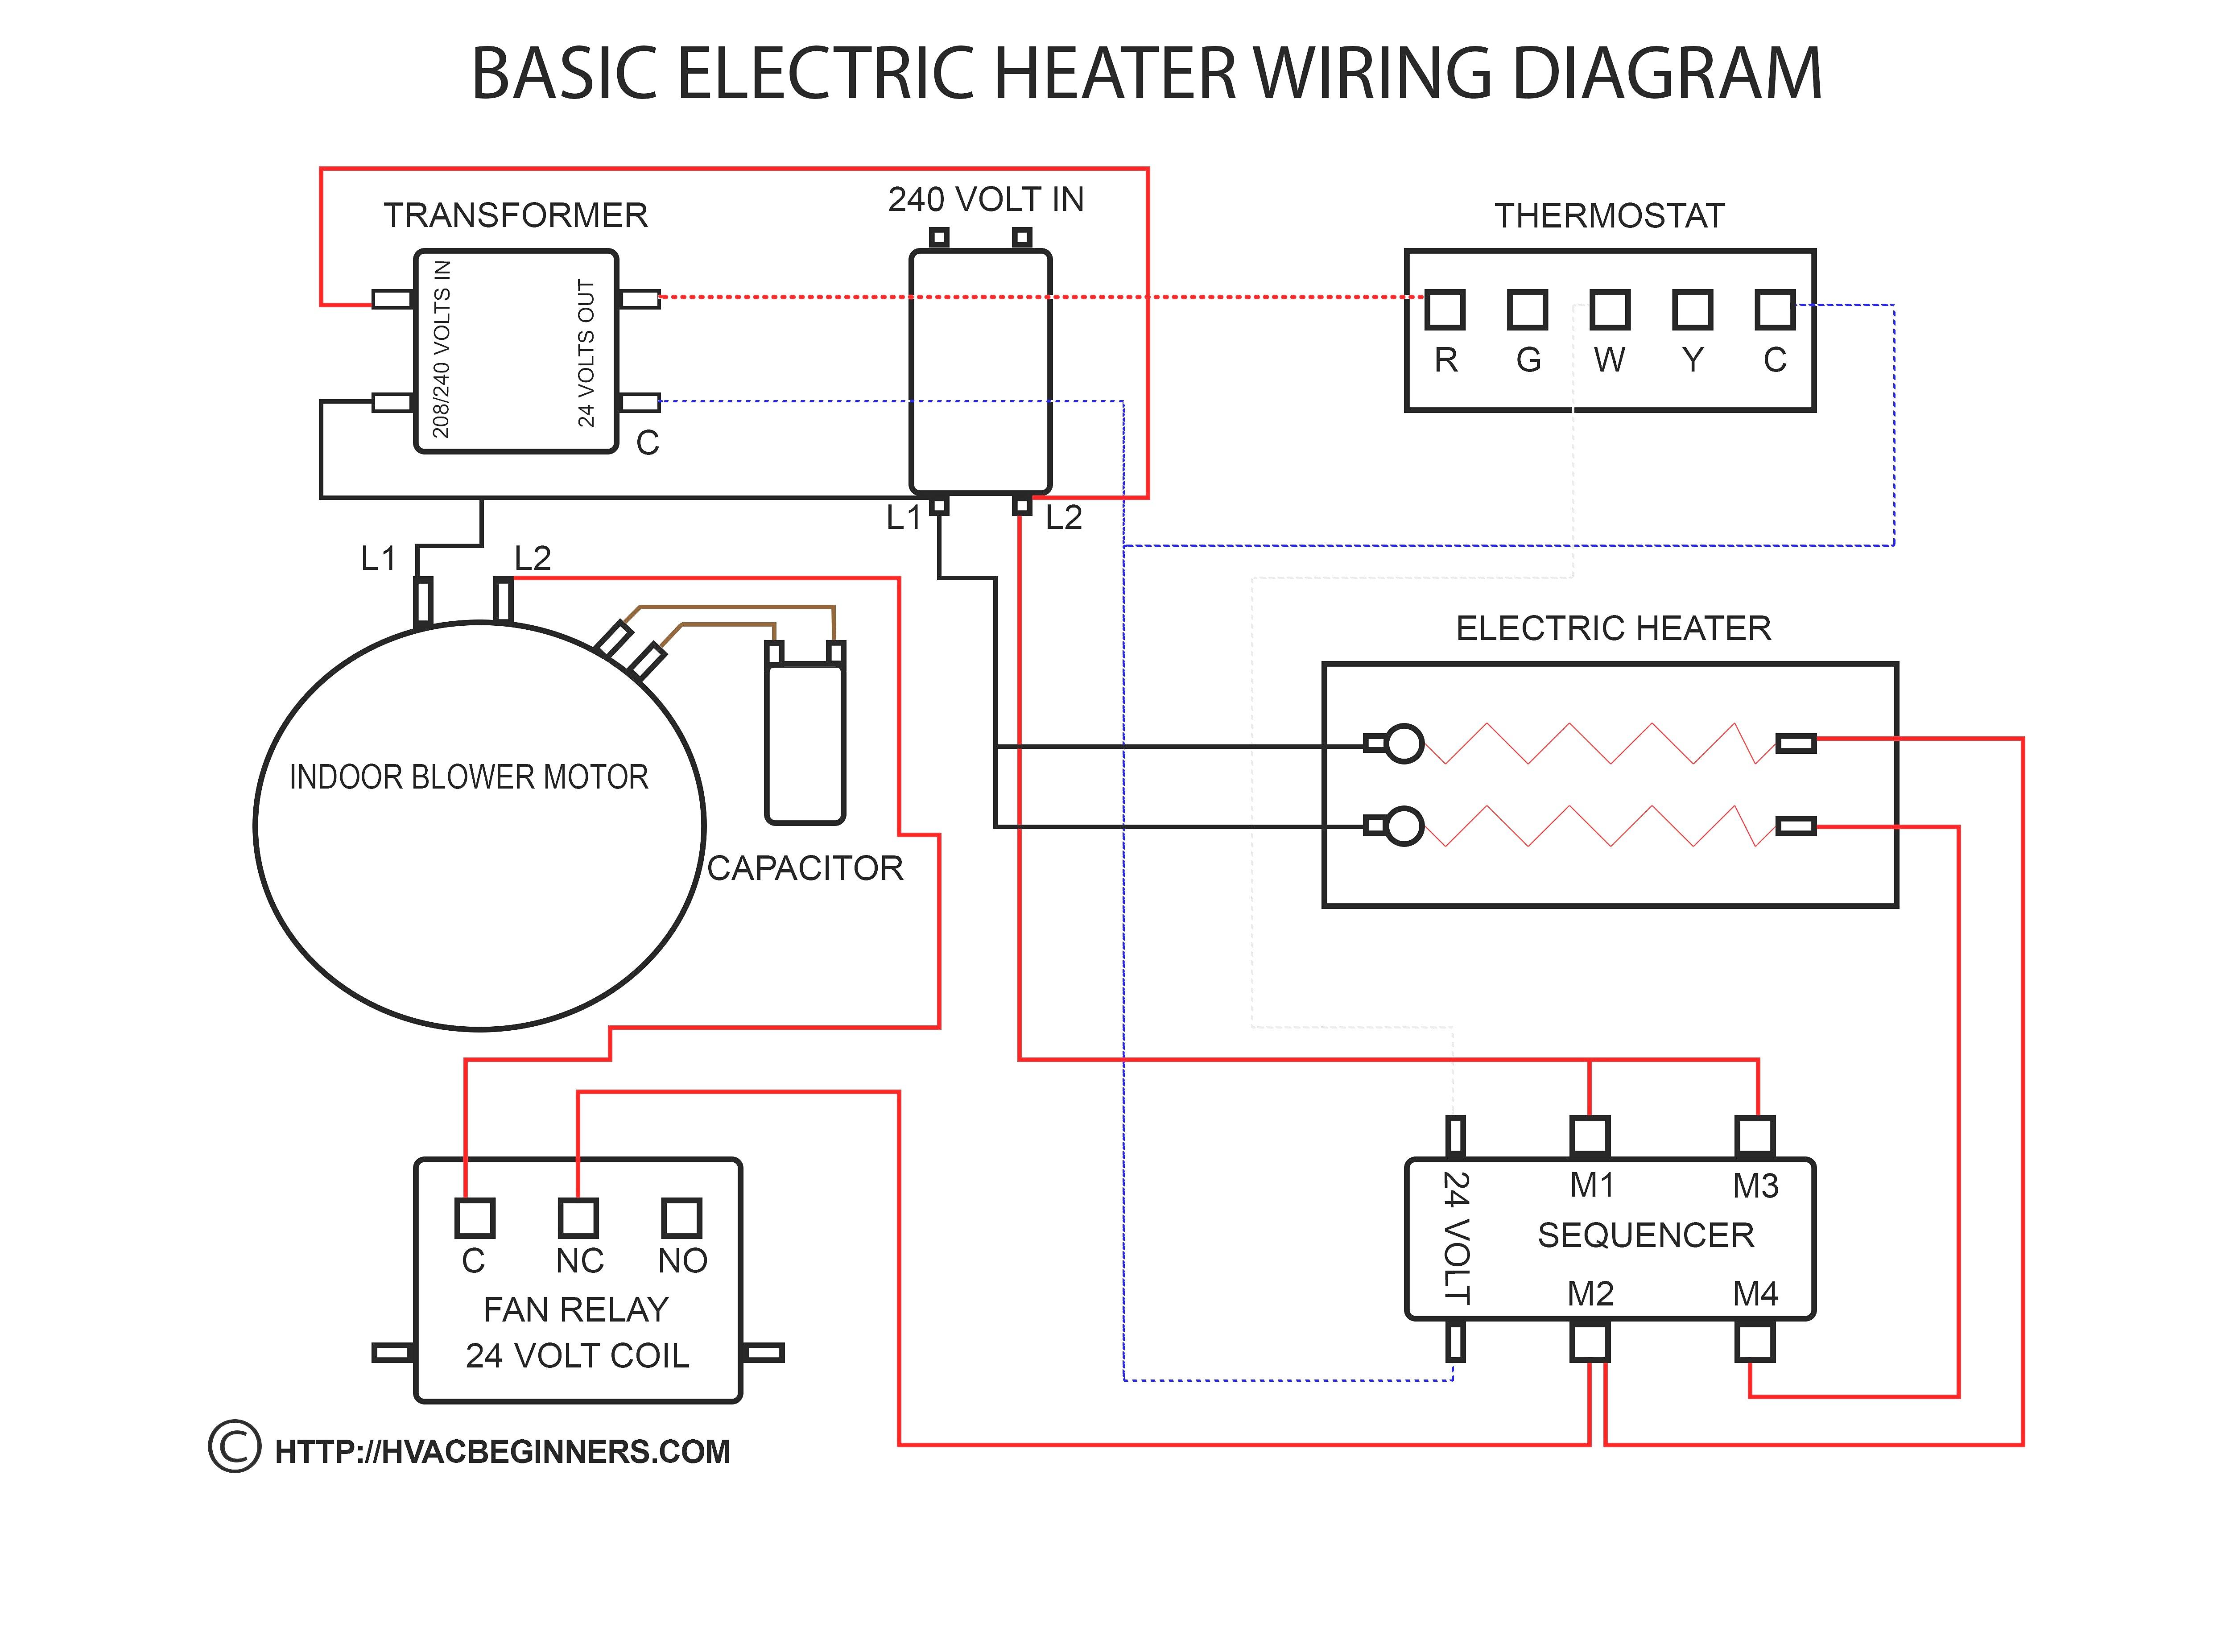 Goodman Air Handler To Heat Pump Wiring Diagram | Wiring Diagram - Goodman Heat Pump Thermostat Wiring Diagram